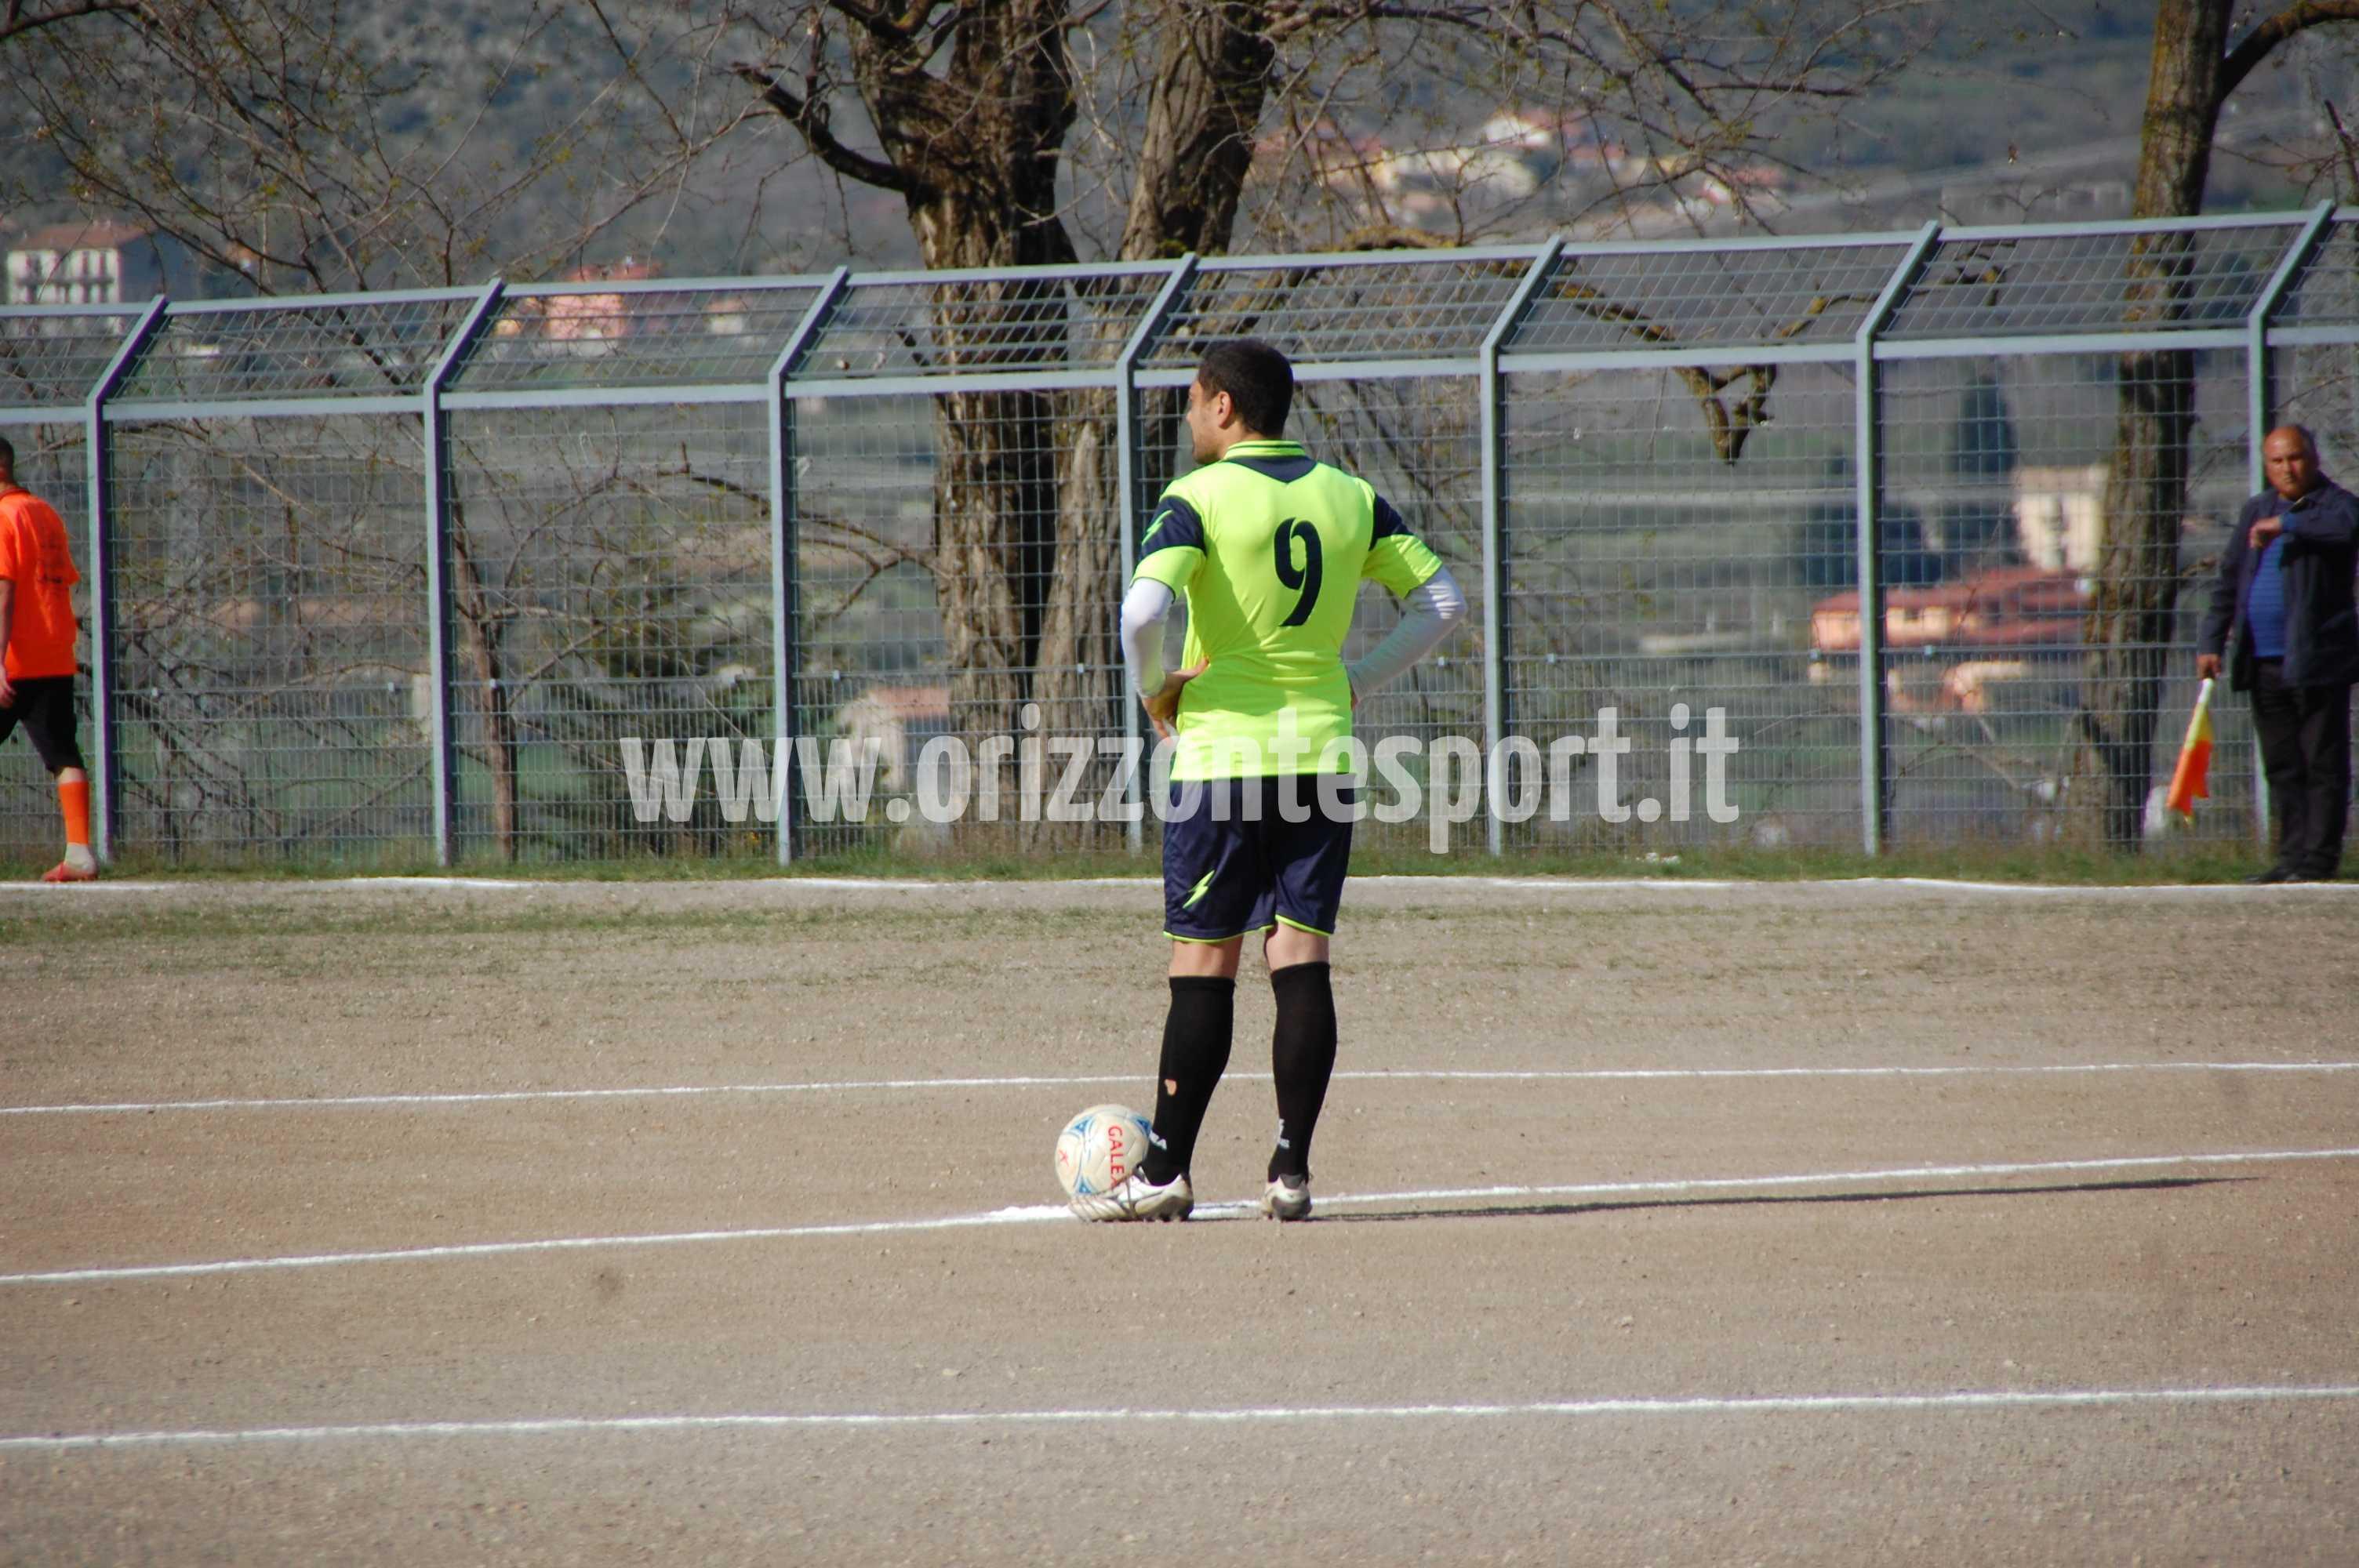 gnettimorano_praiatortora (16)